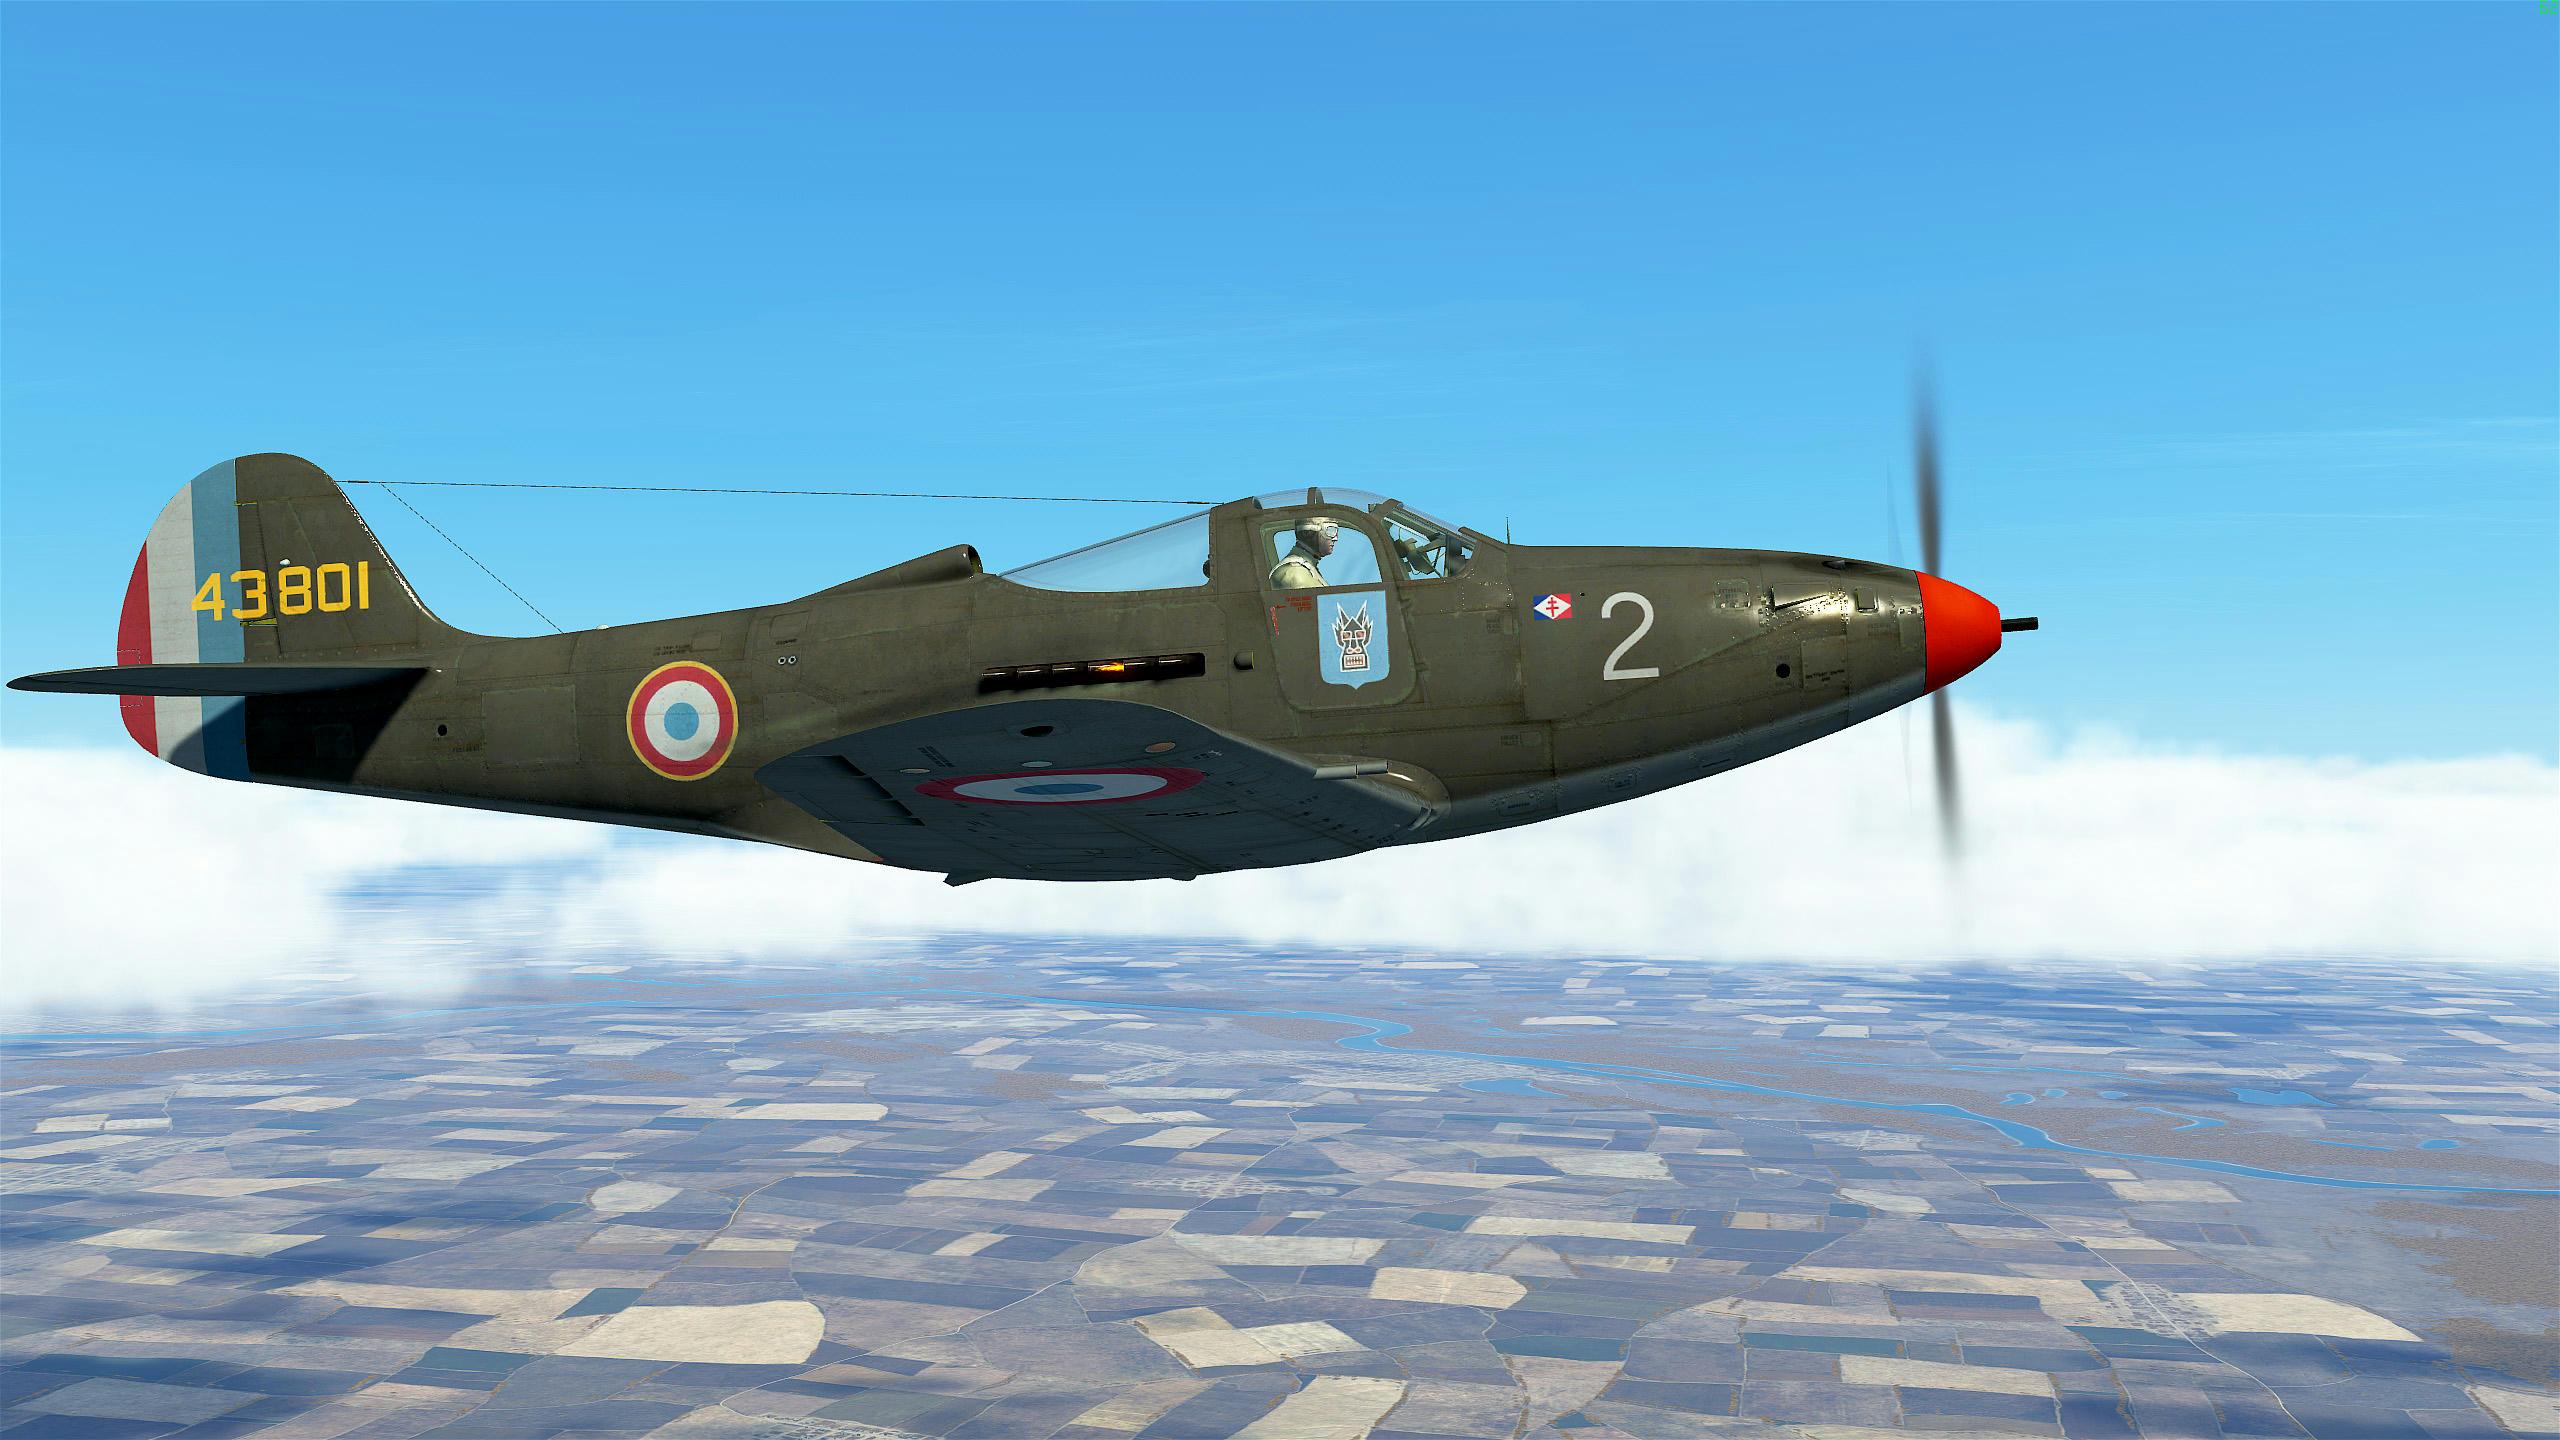 PACK P-39 FRANCAIS 7nql7p4h8d2yeybzg